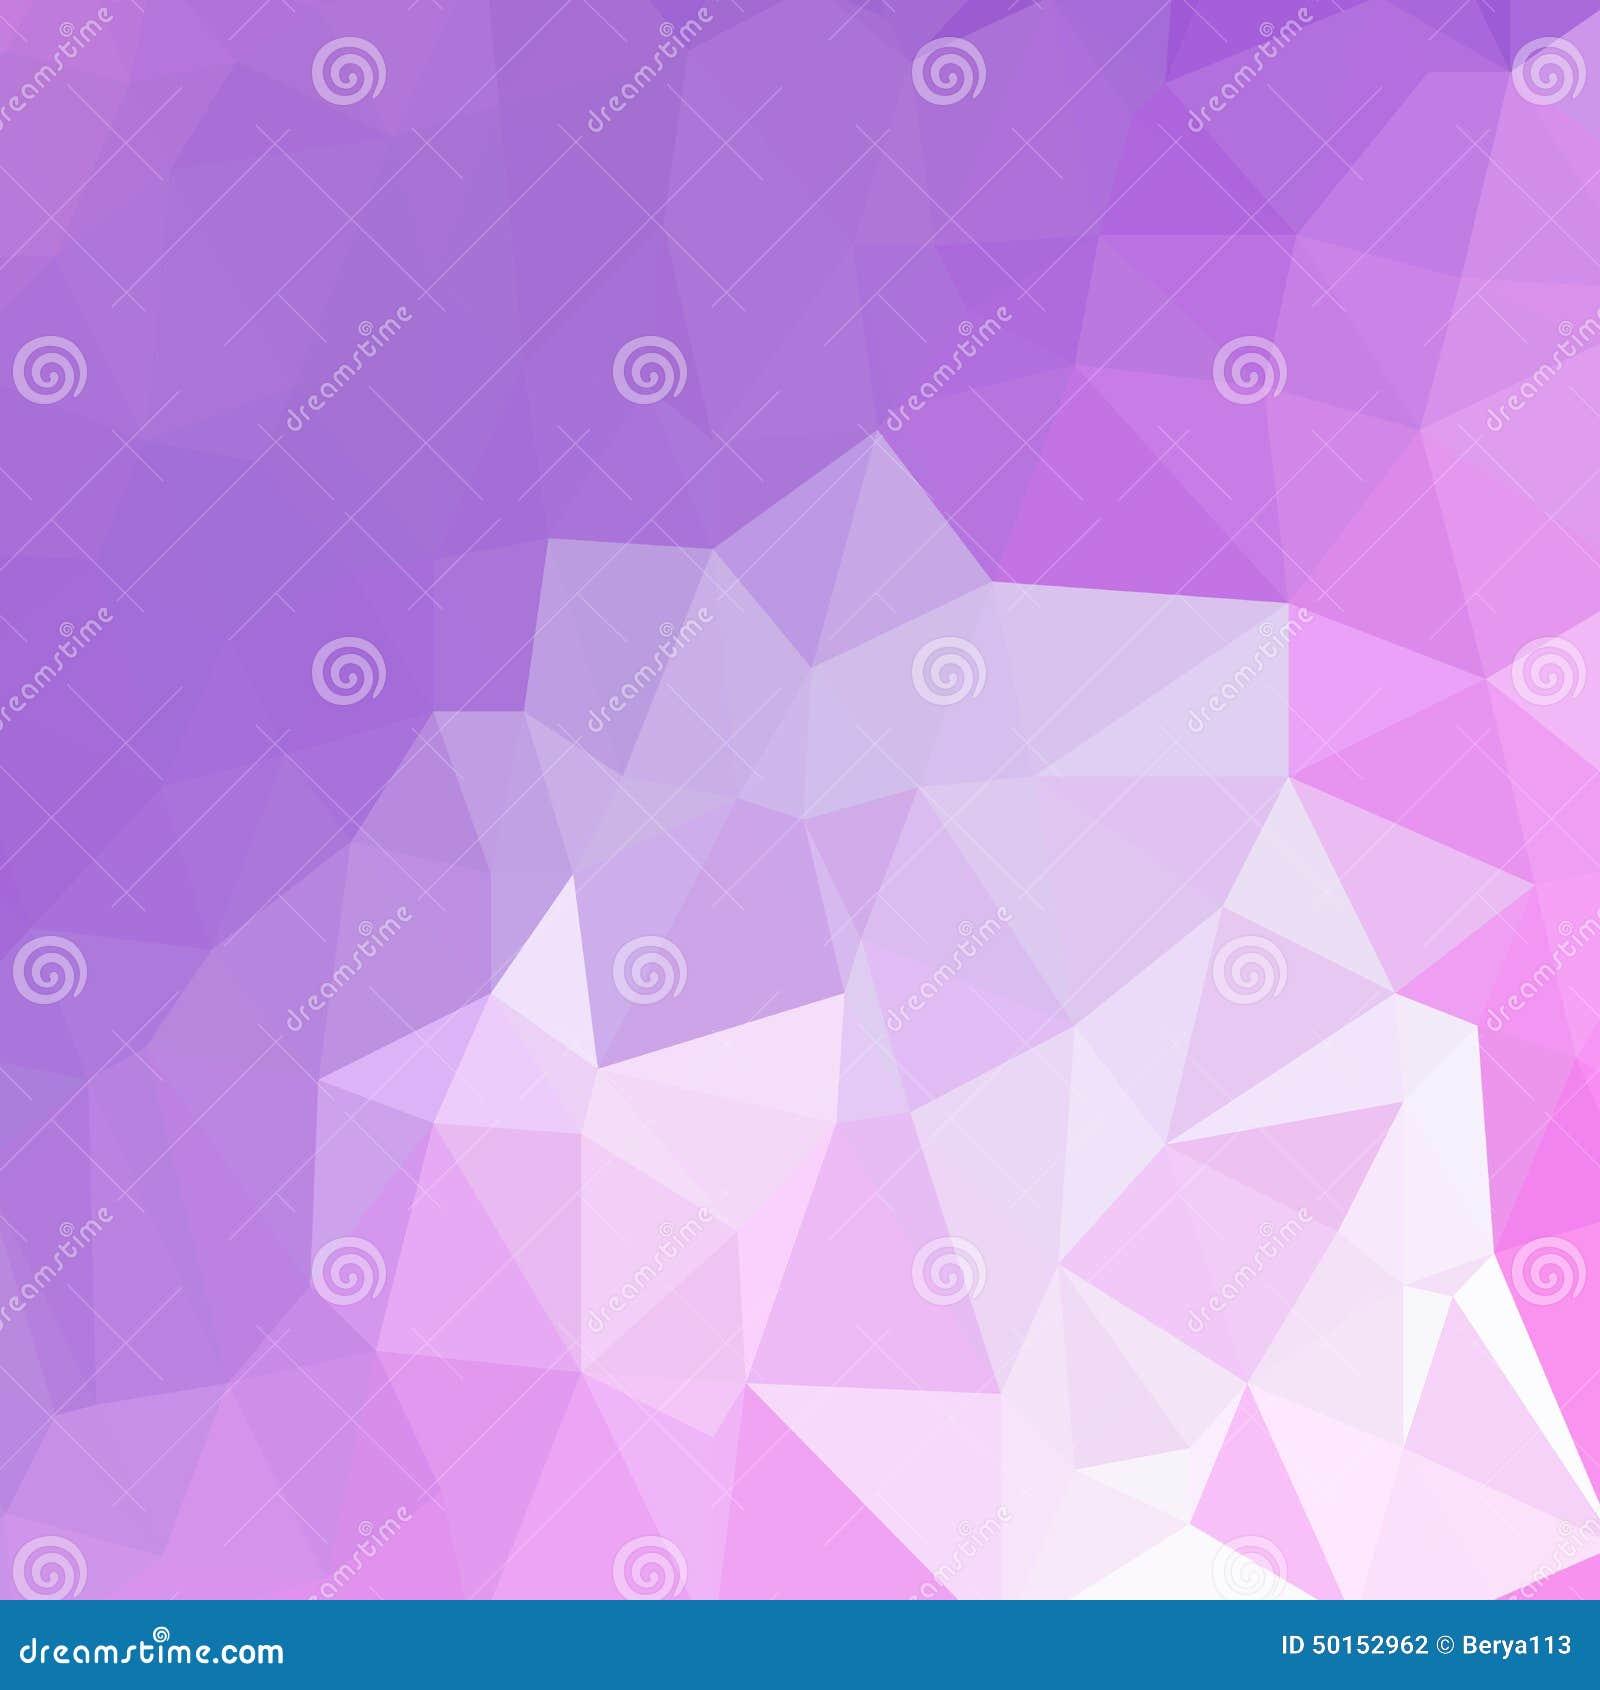 abstract light purple background wwwimgkidcom the